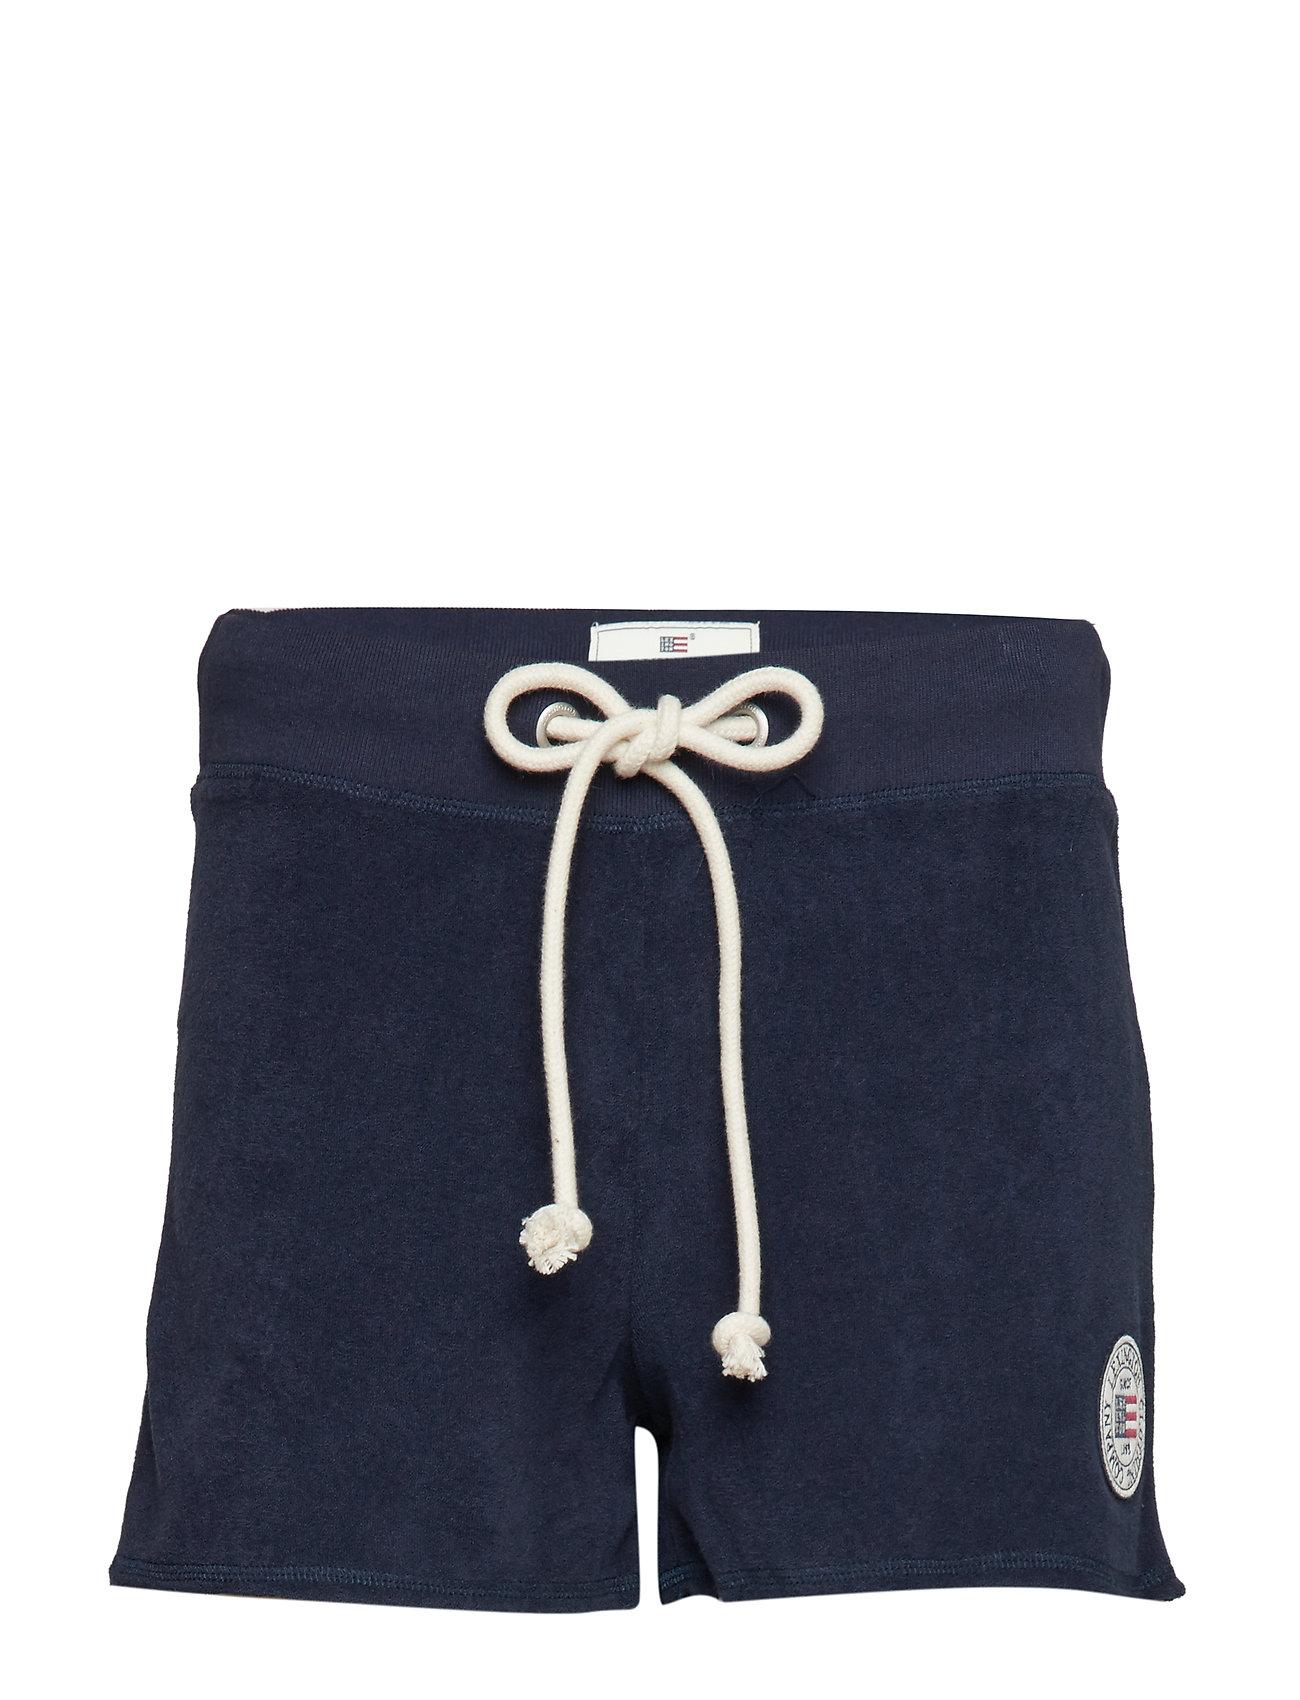 Lexington Clothing Naomi Terry Shorts - NAVY BLUE